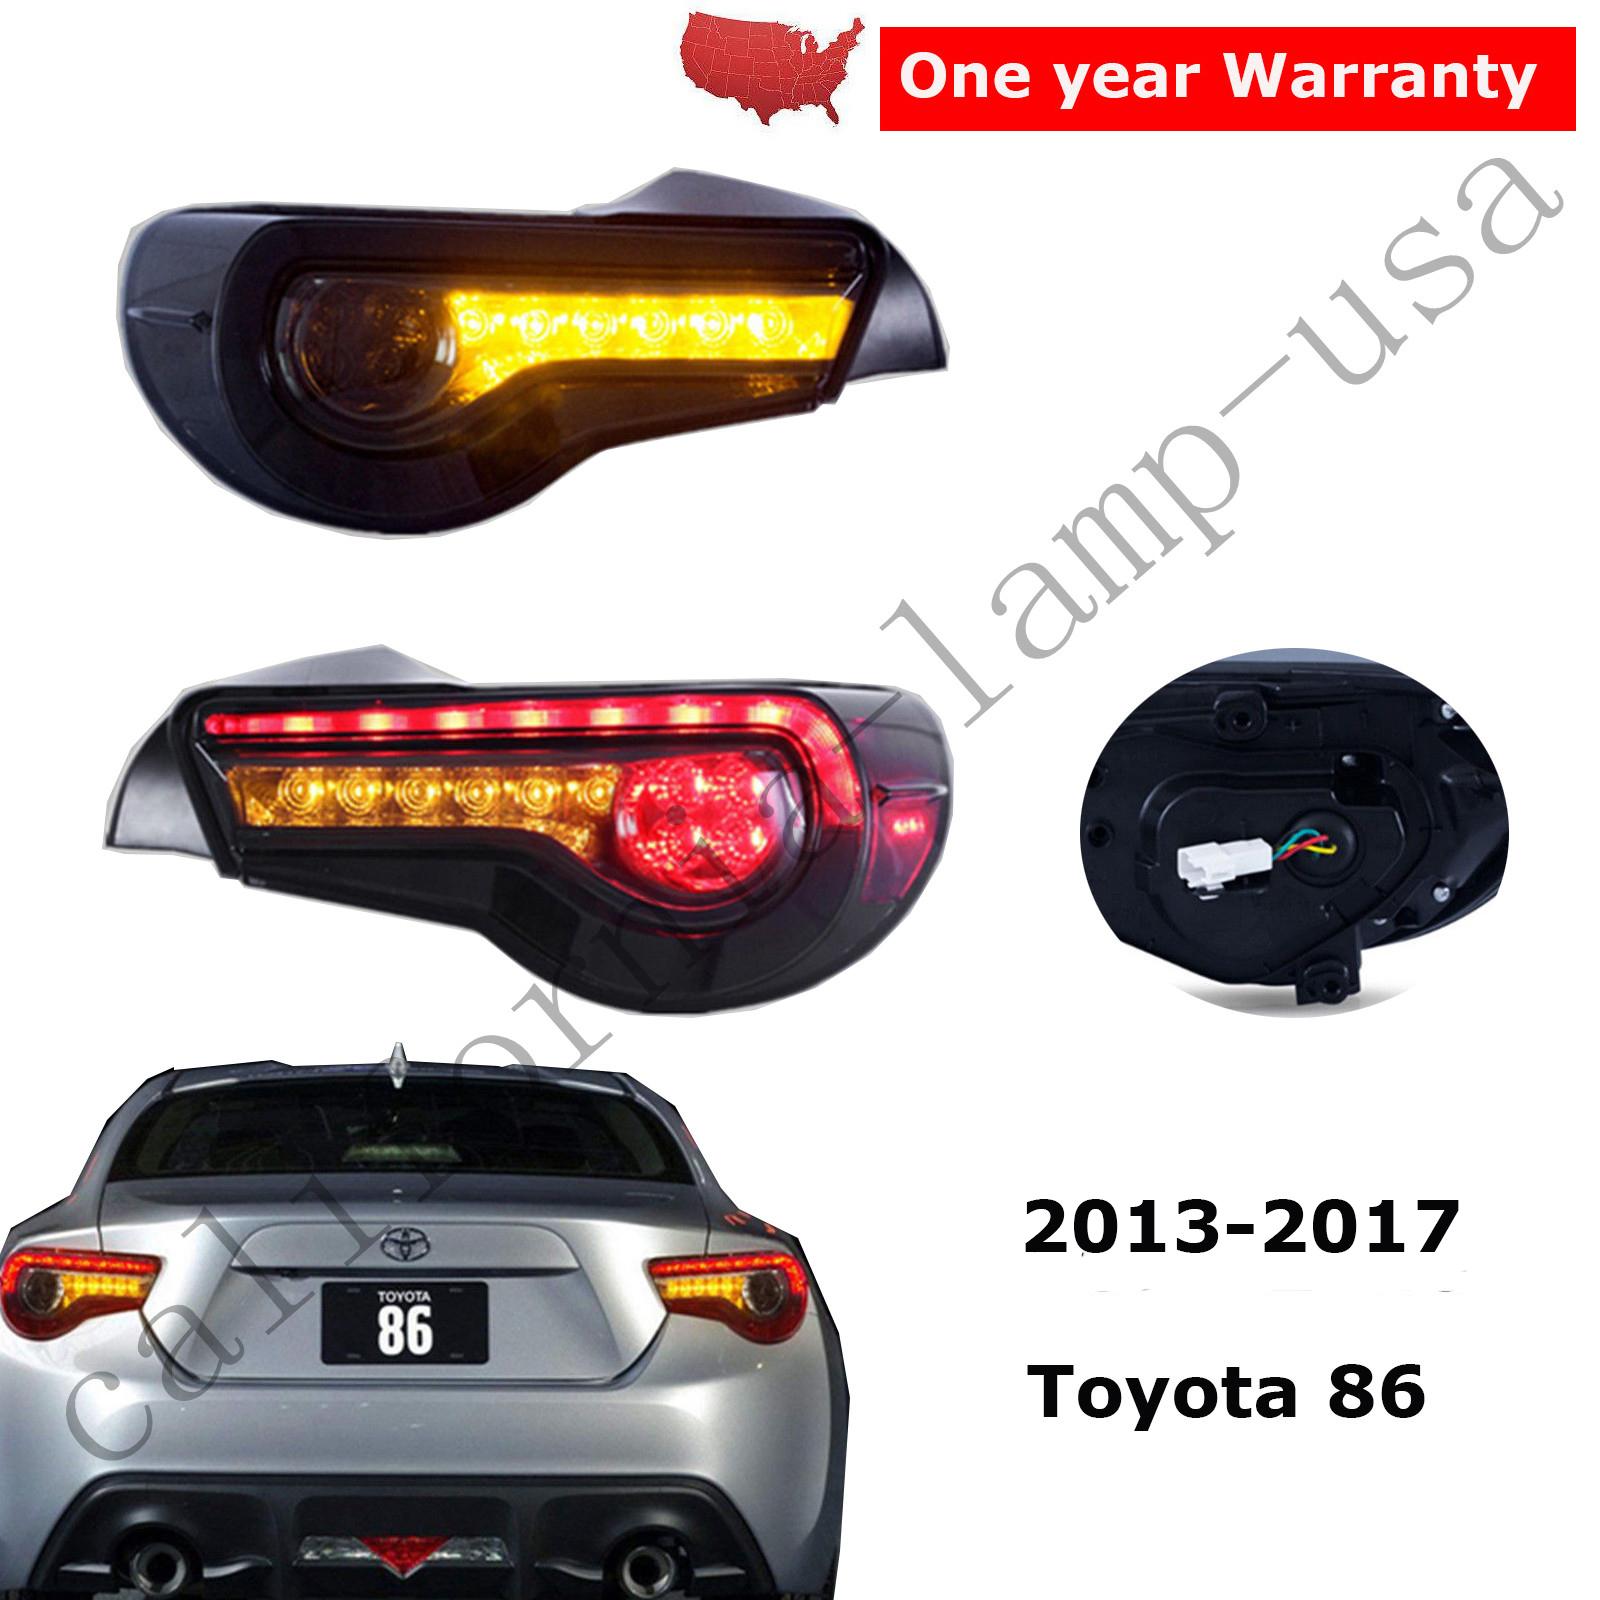 Lights Lamps For Rear Tail Haitiro Led 86 Fr Subaru Toyota S Scion dQBeWroCx